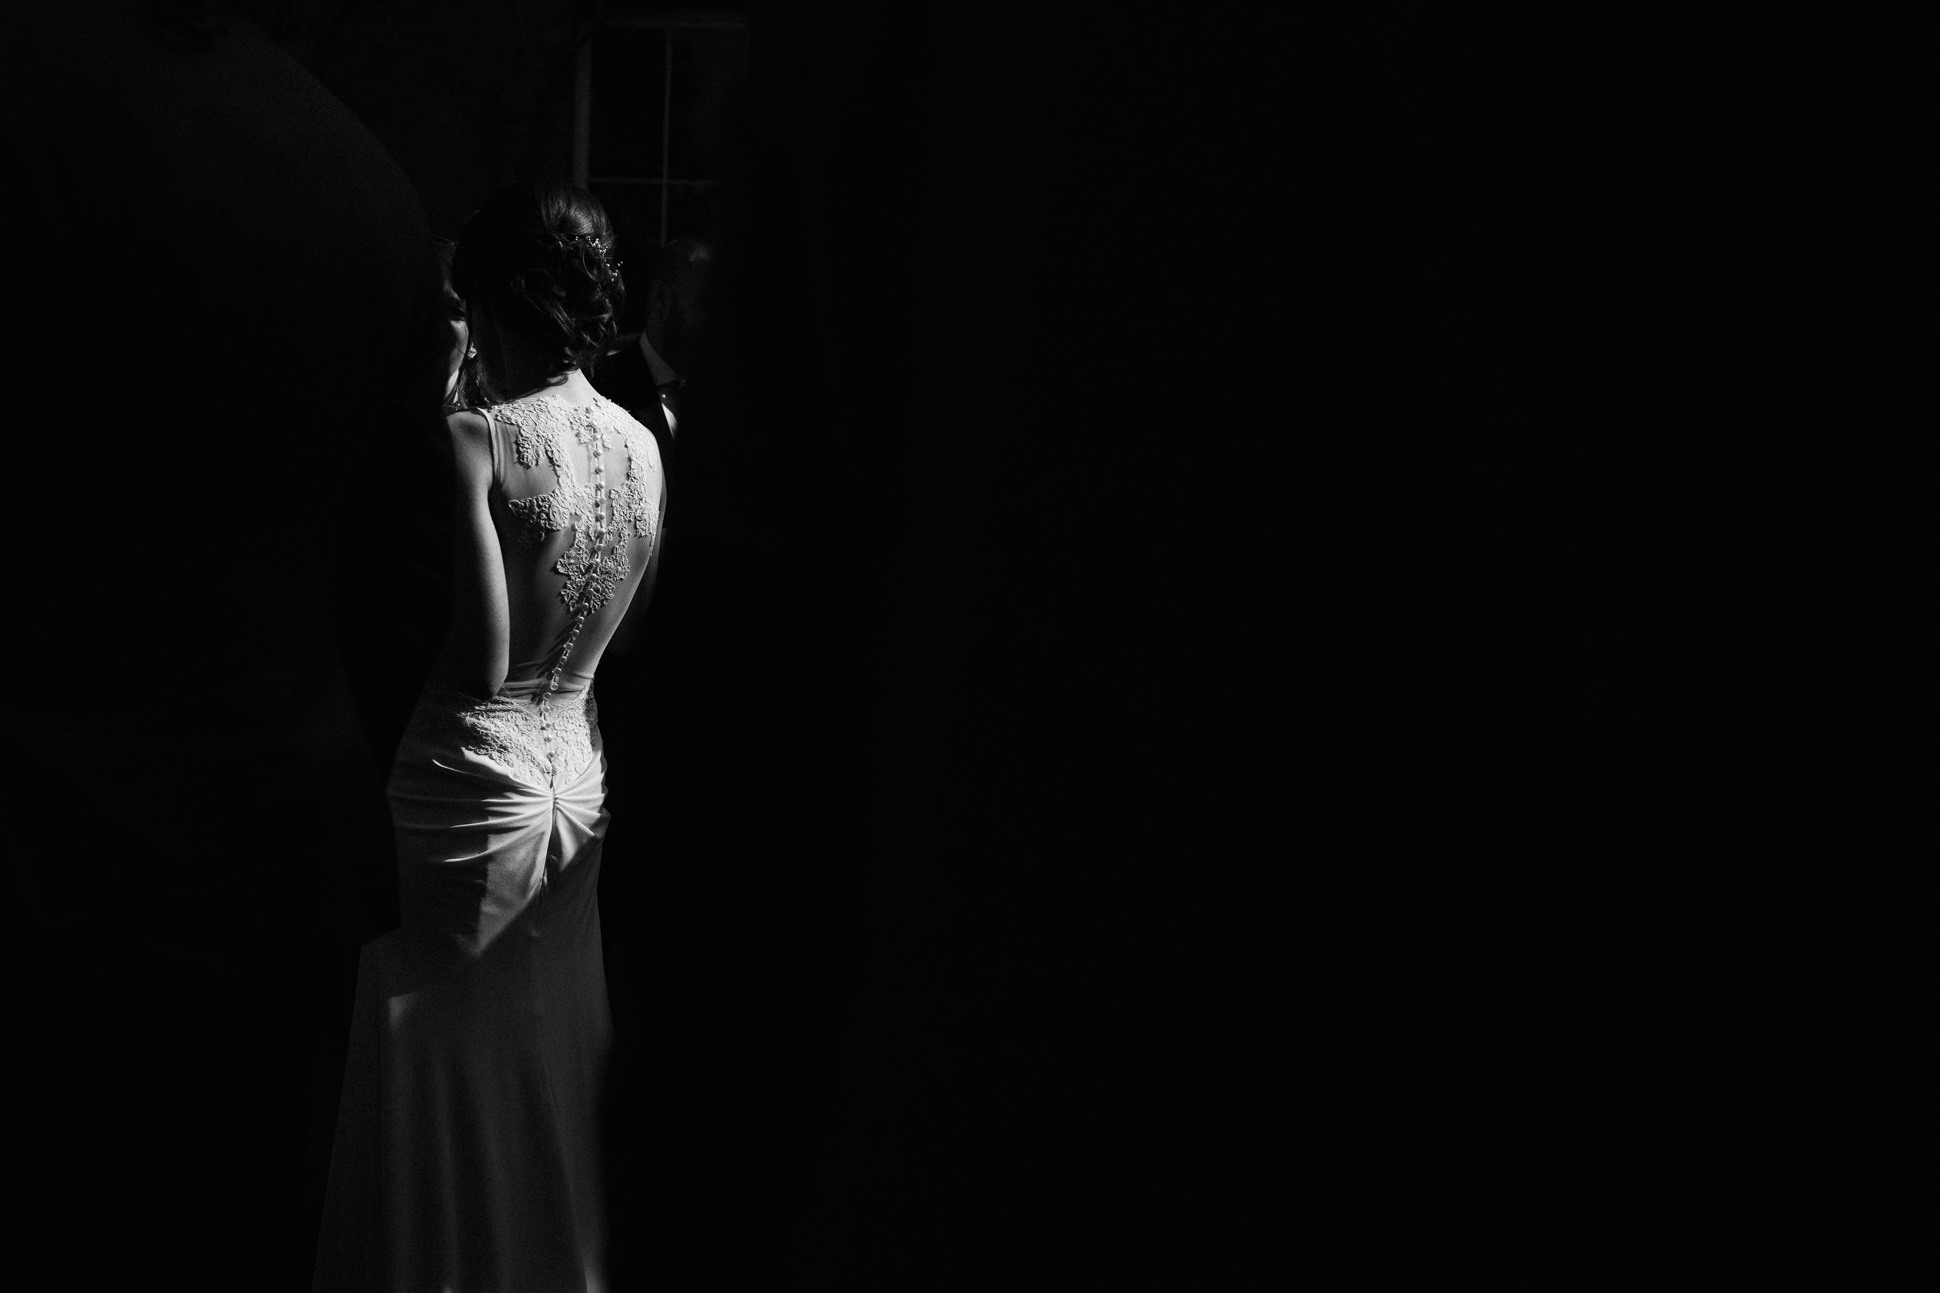 brides wedding dress back